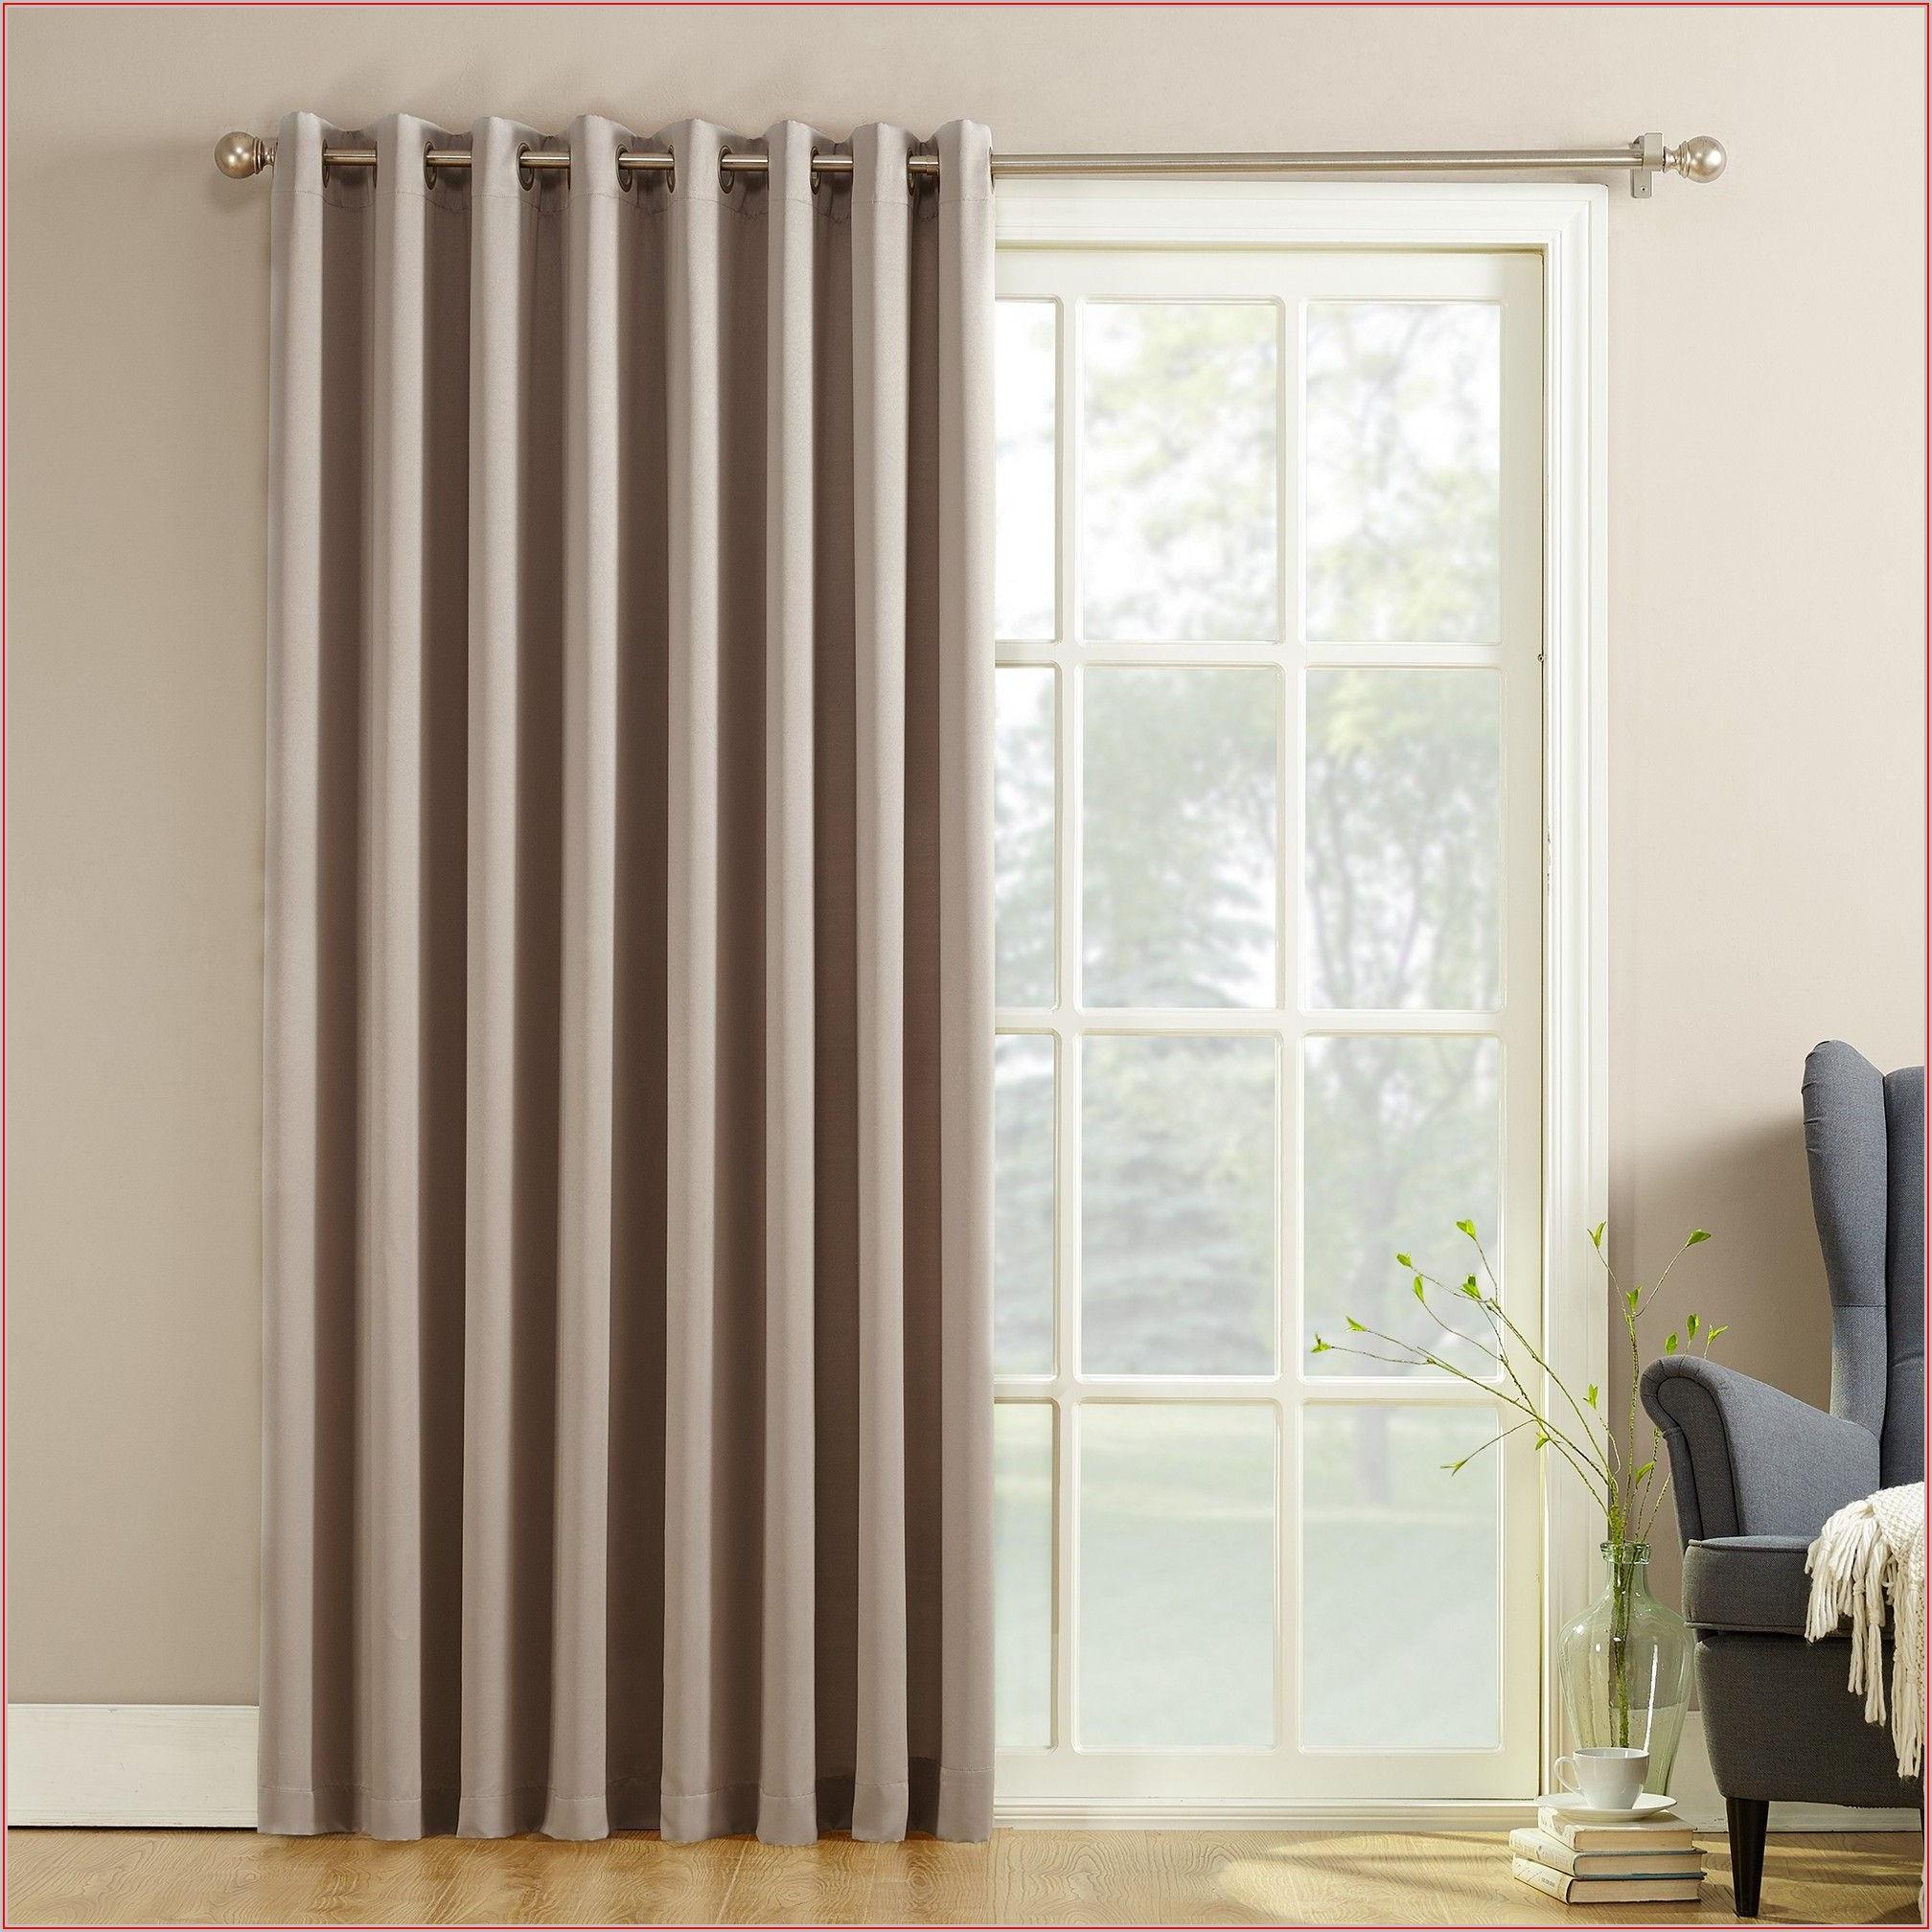 Best Curtain Rods For Patio Doors